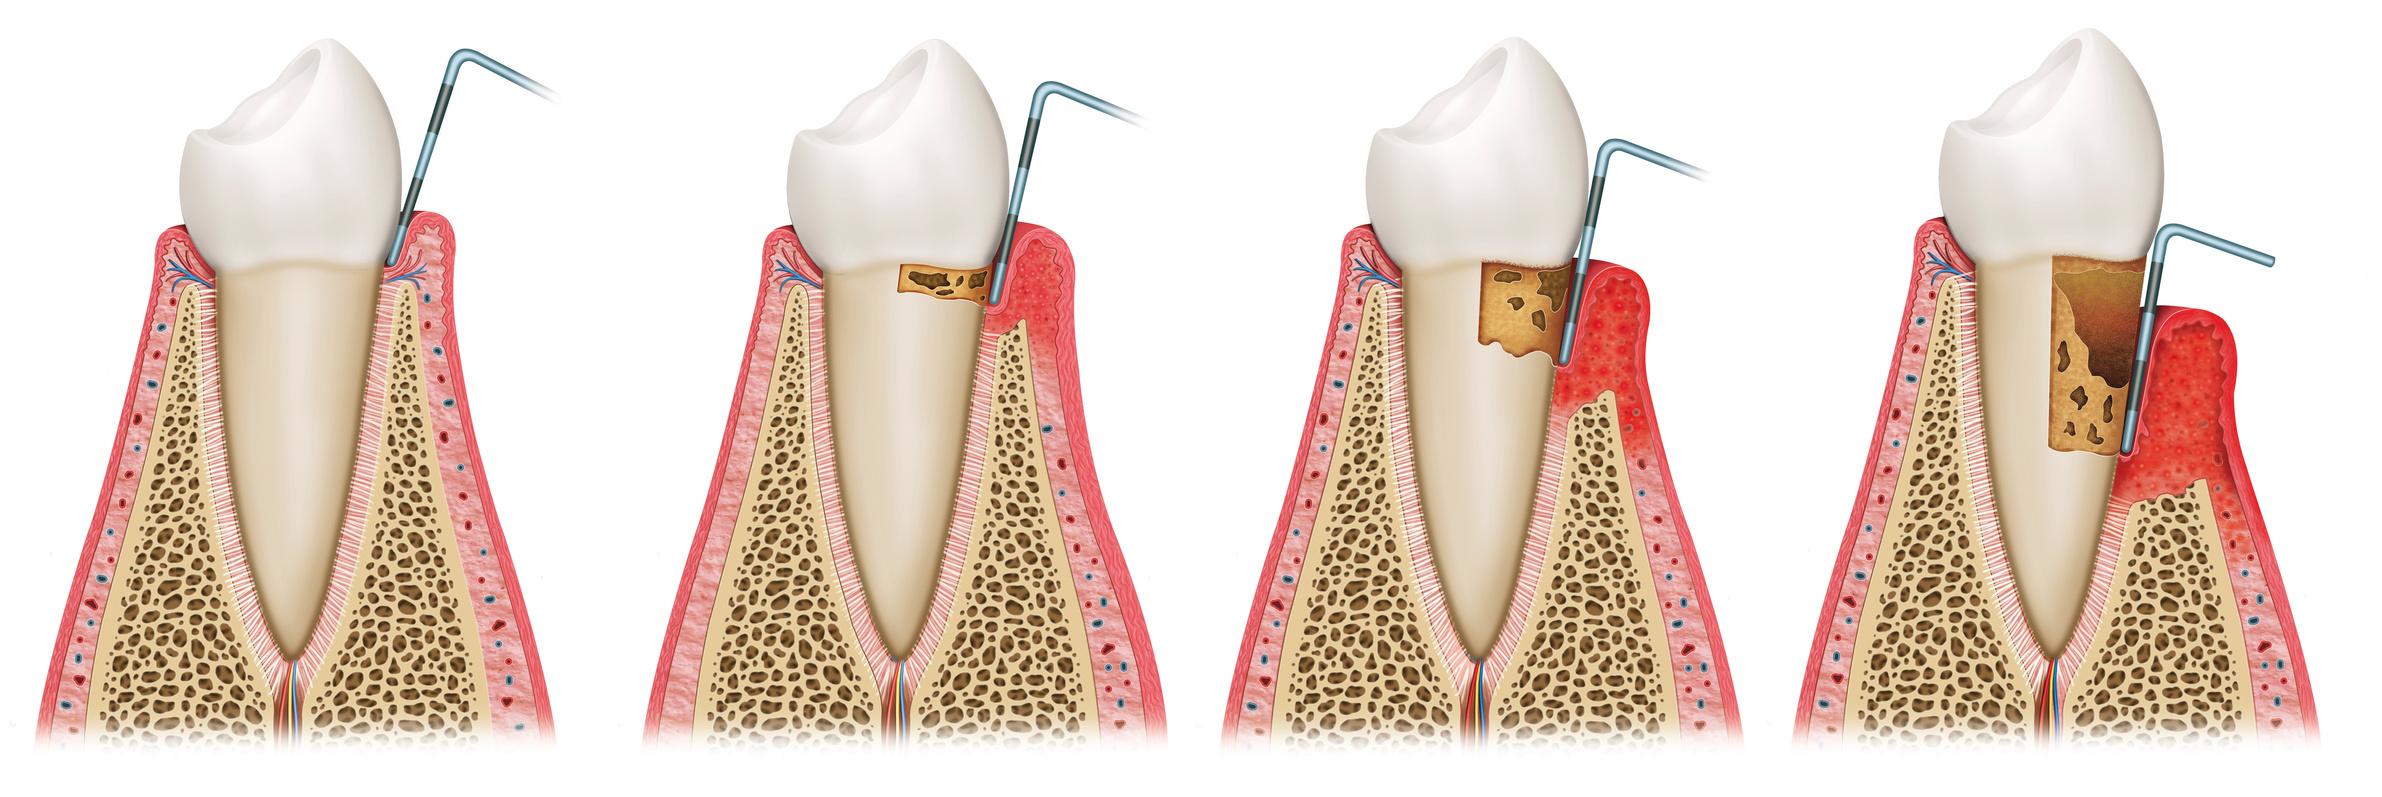 parodontologie zahnarztpraxis dr. ascher münchen bogenhausen